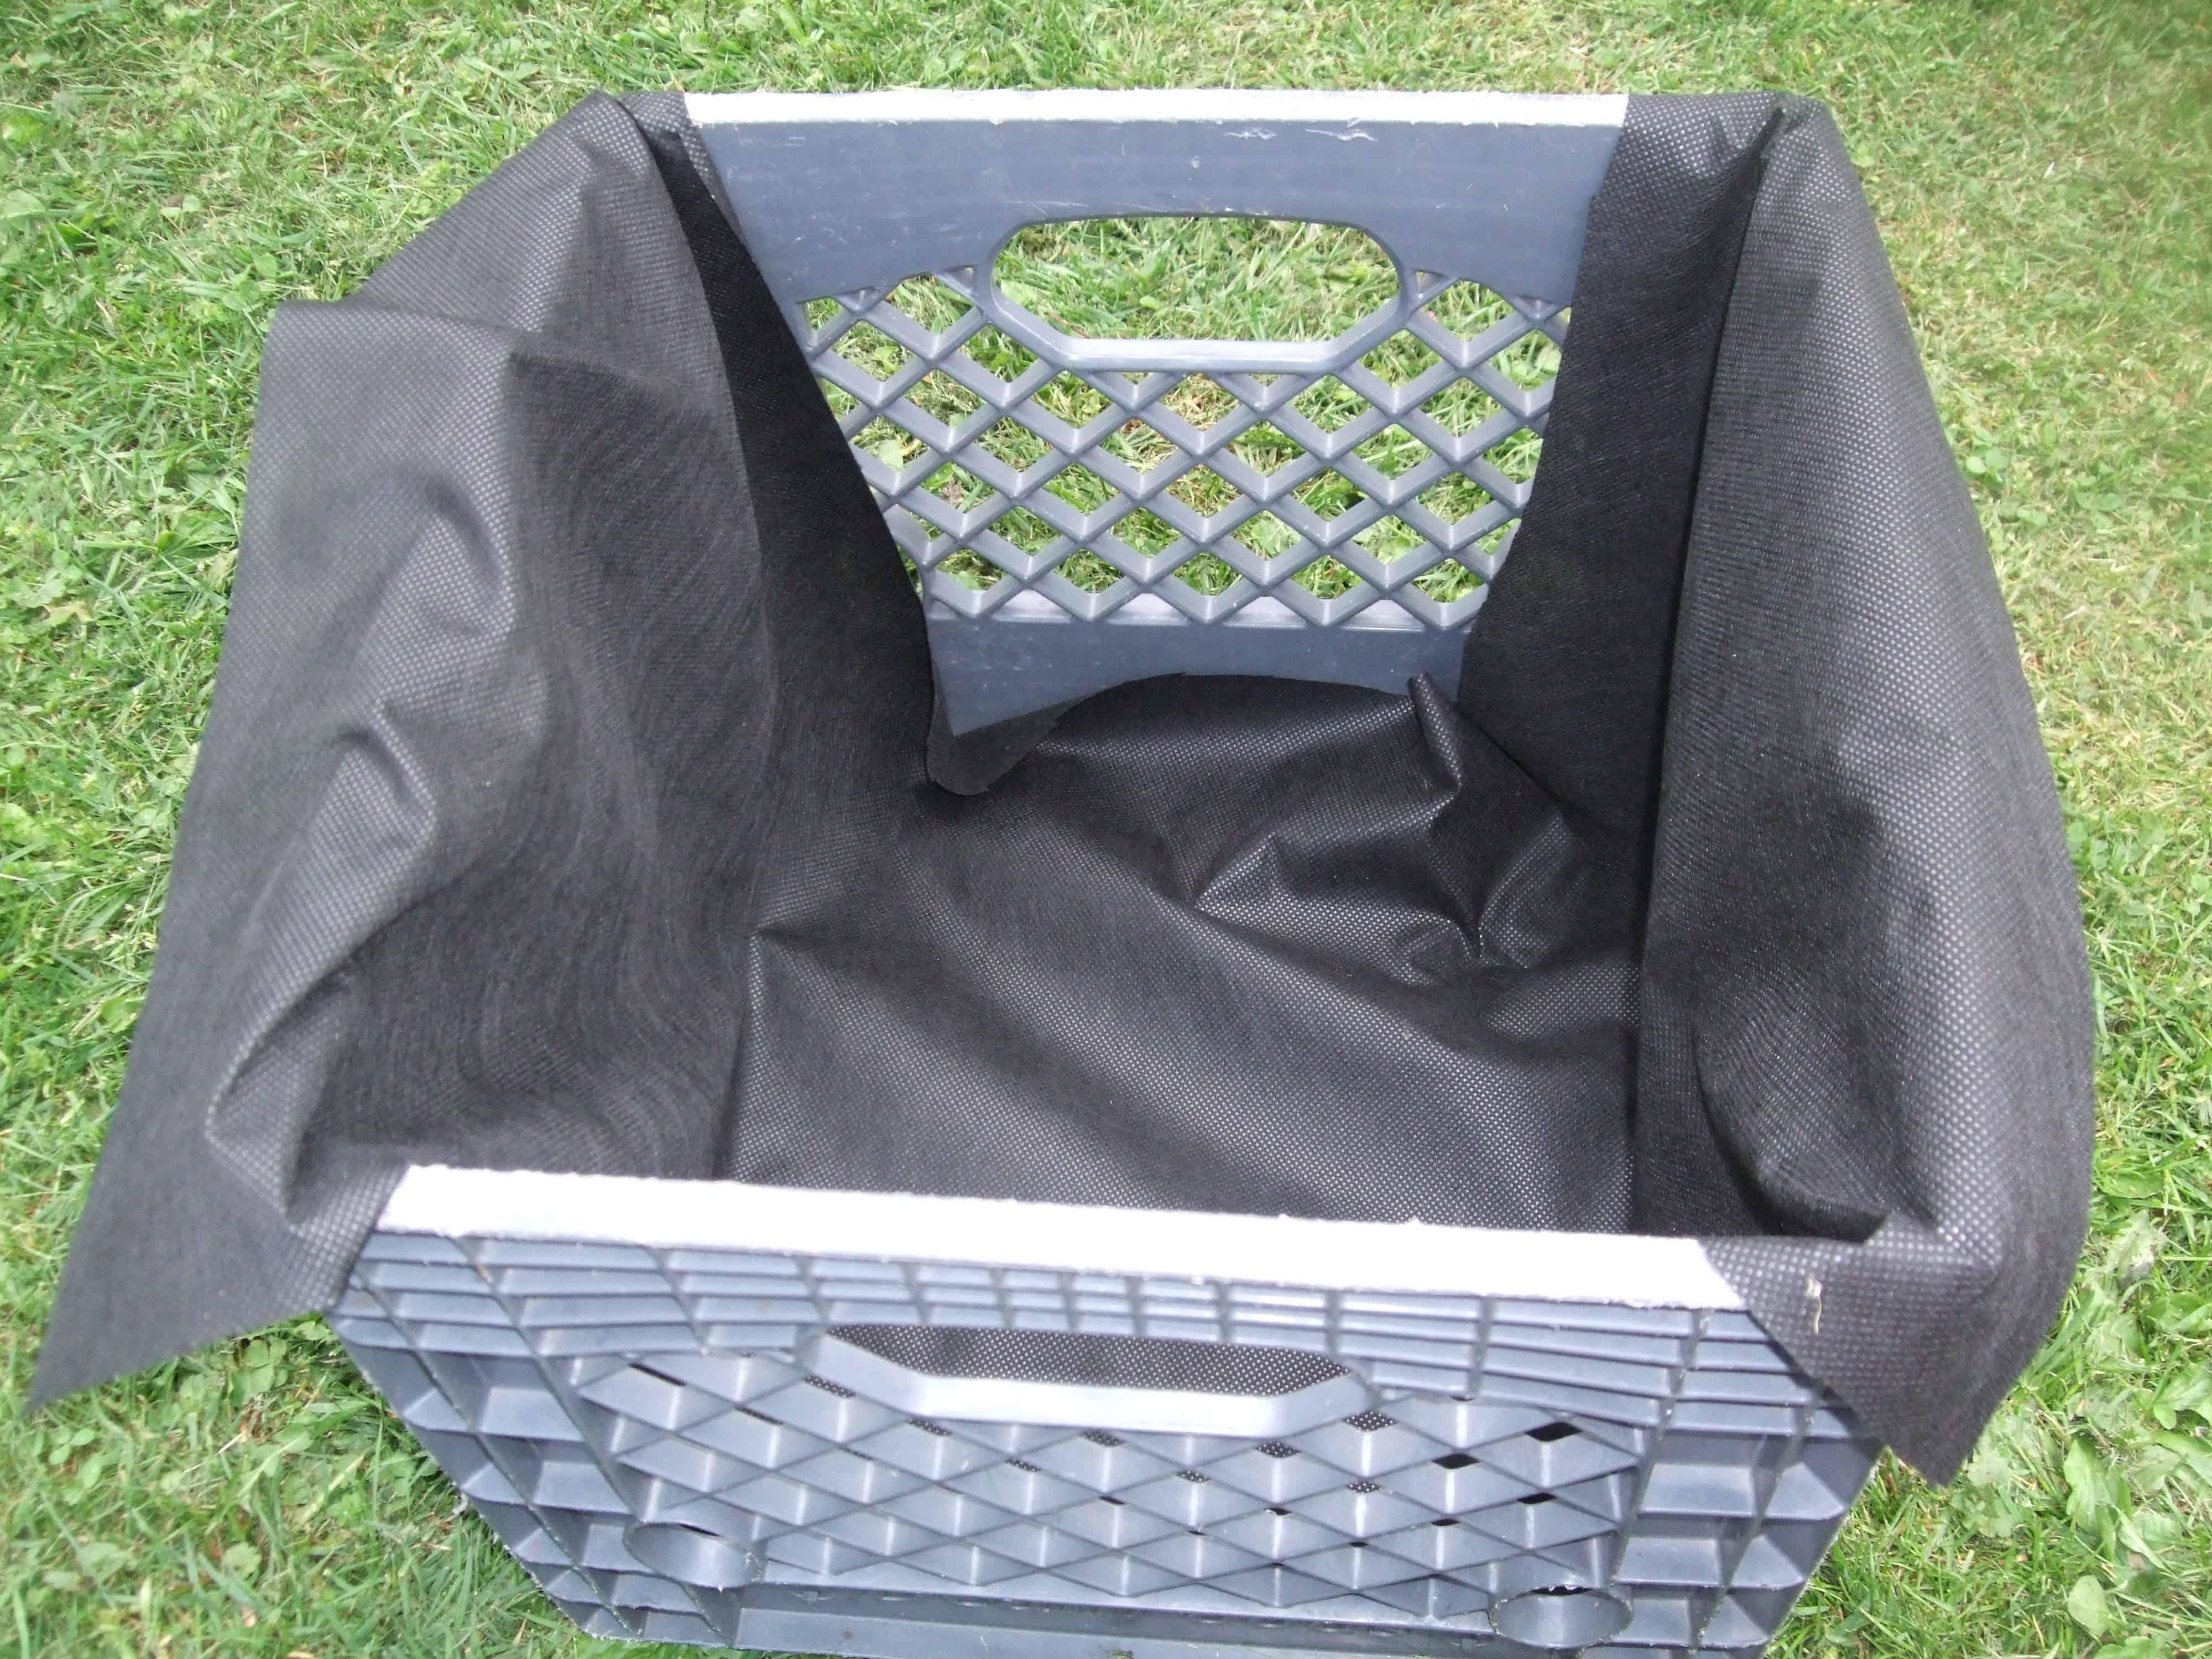 make a milk crate garden - Milk Crate Garden